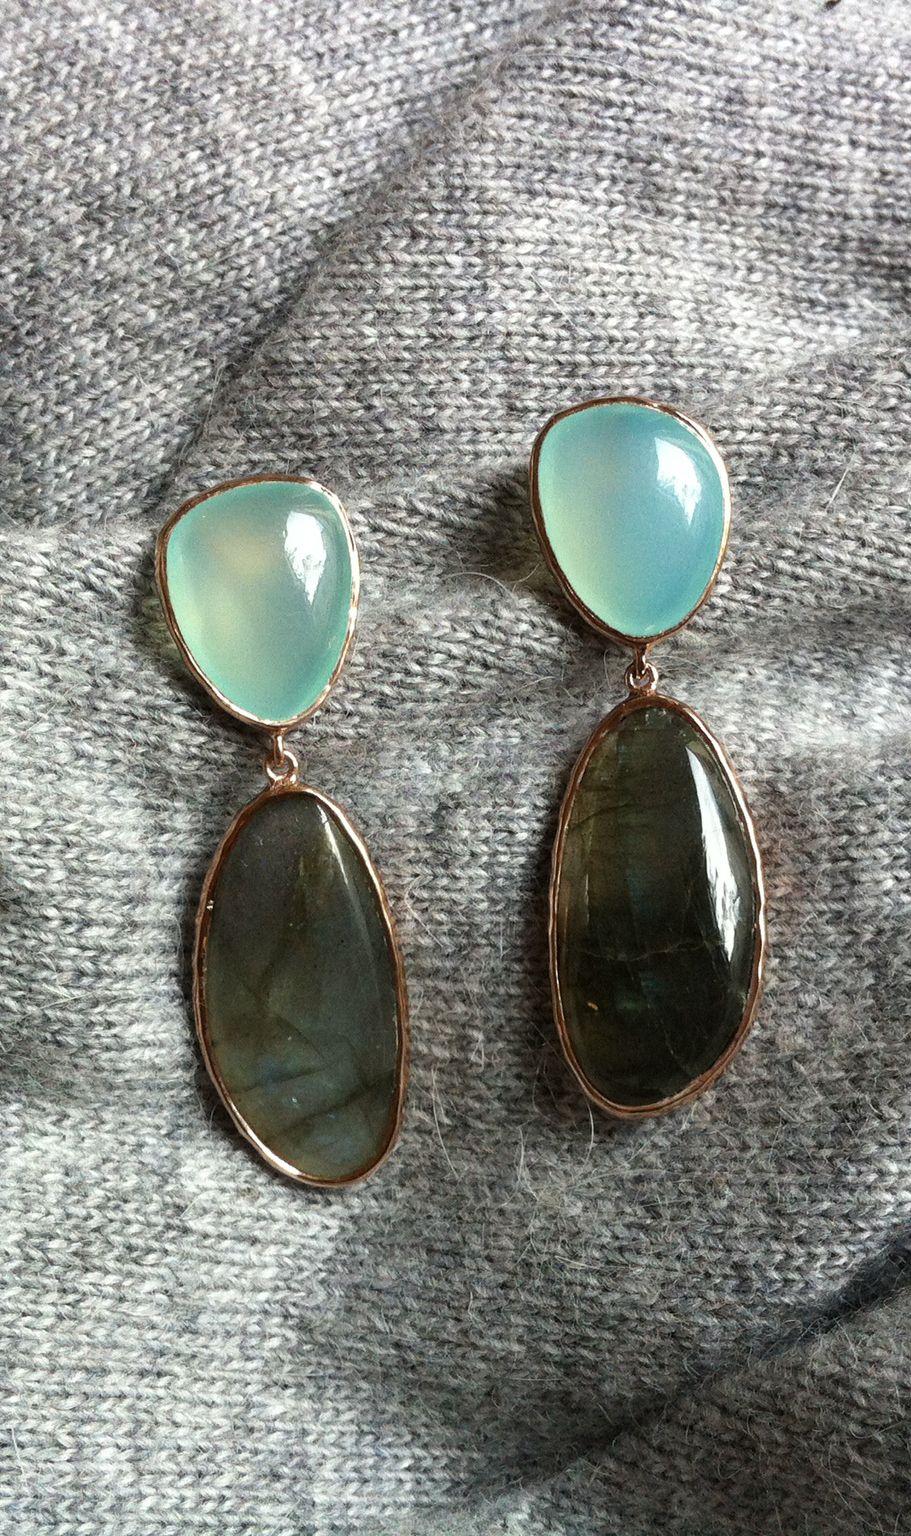 NEWONE-SHOP.COM I #gemstone #earrings